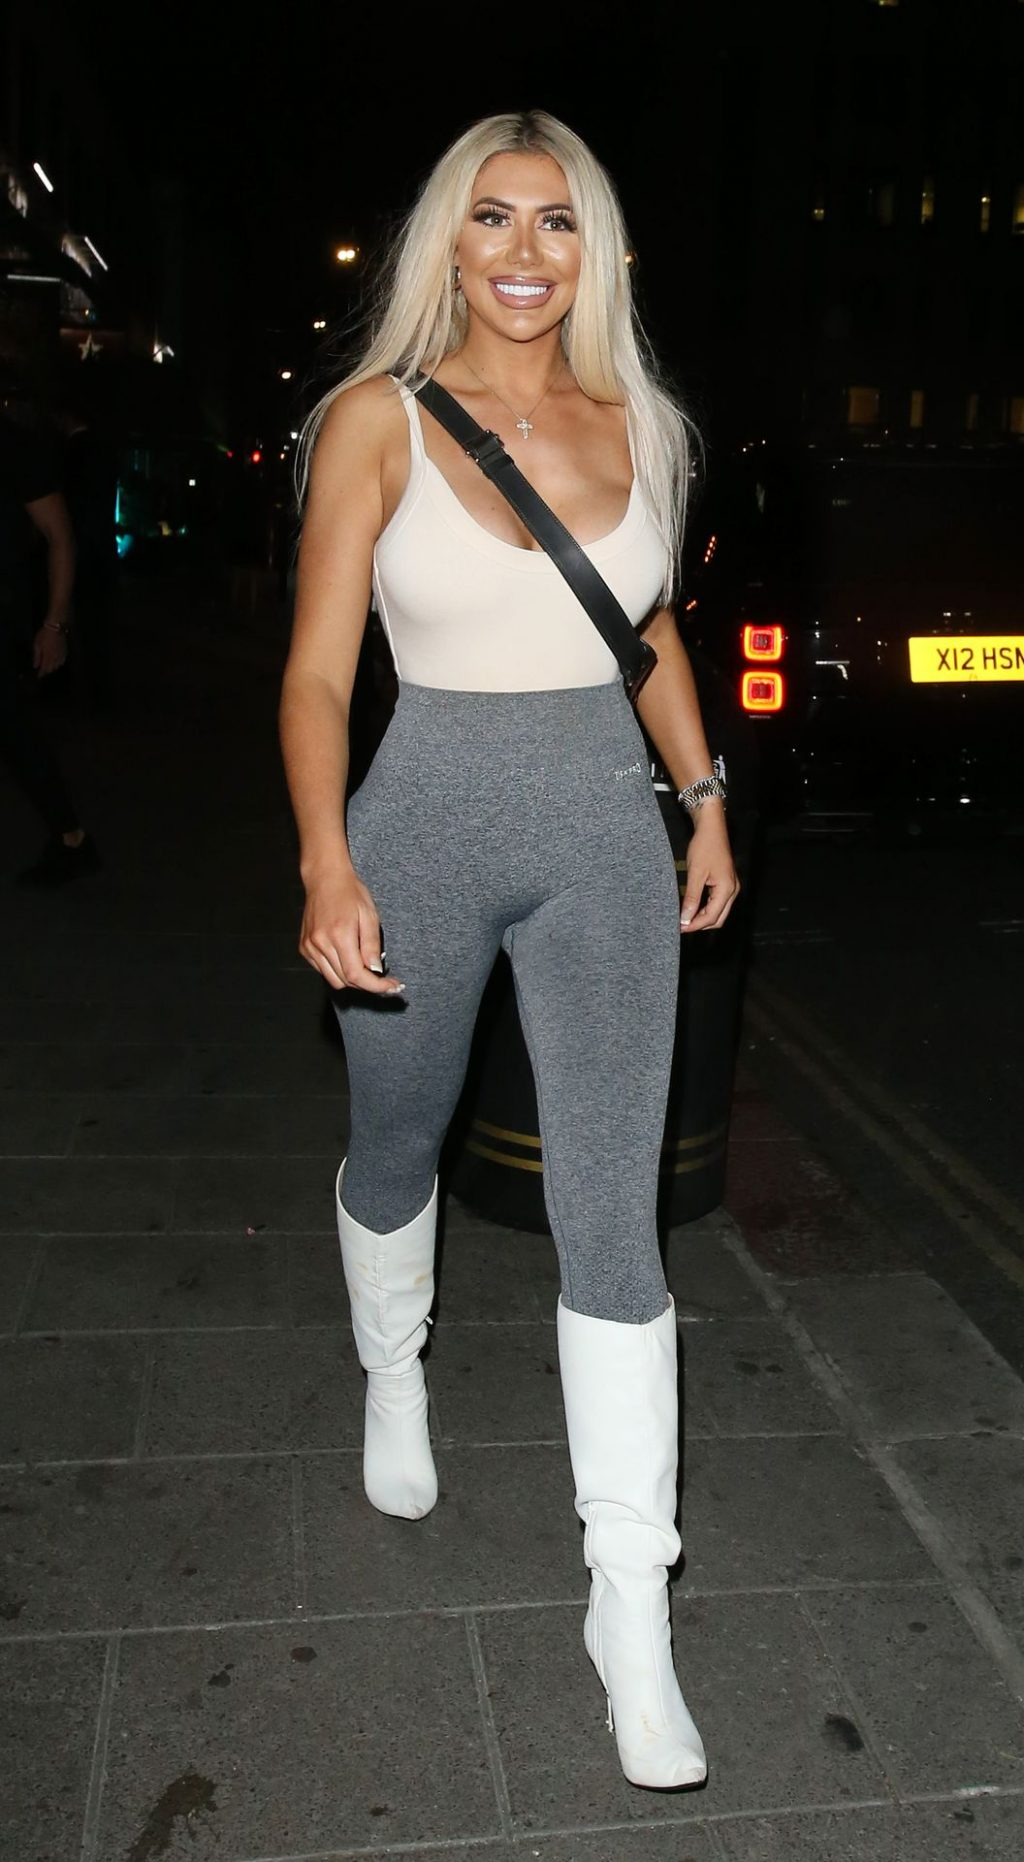 Chloe Ferry Enjoys a Night in London (36 Photos)